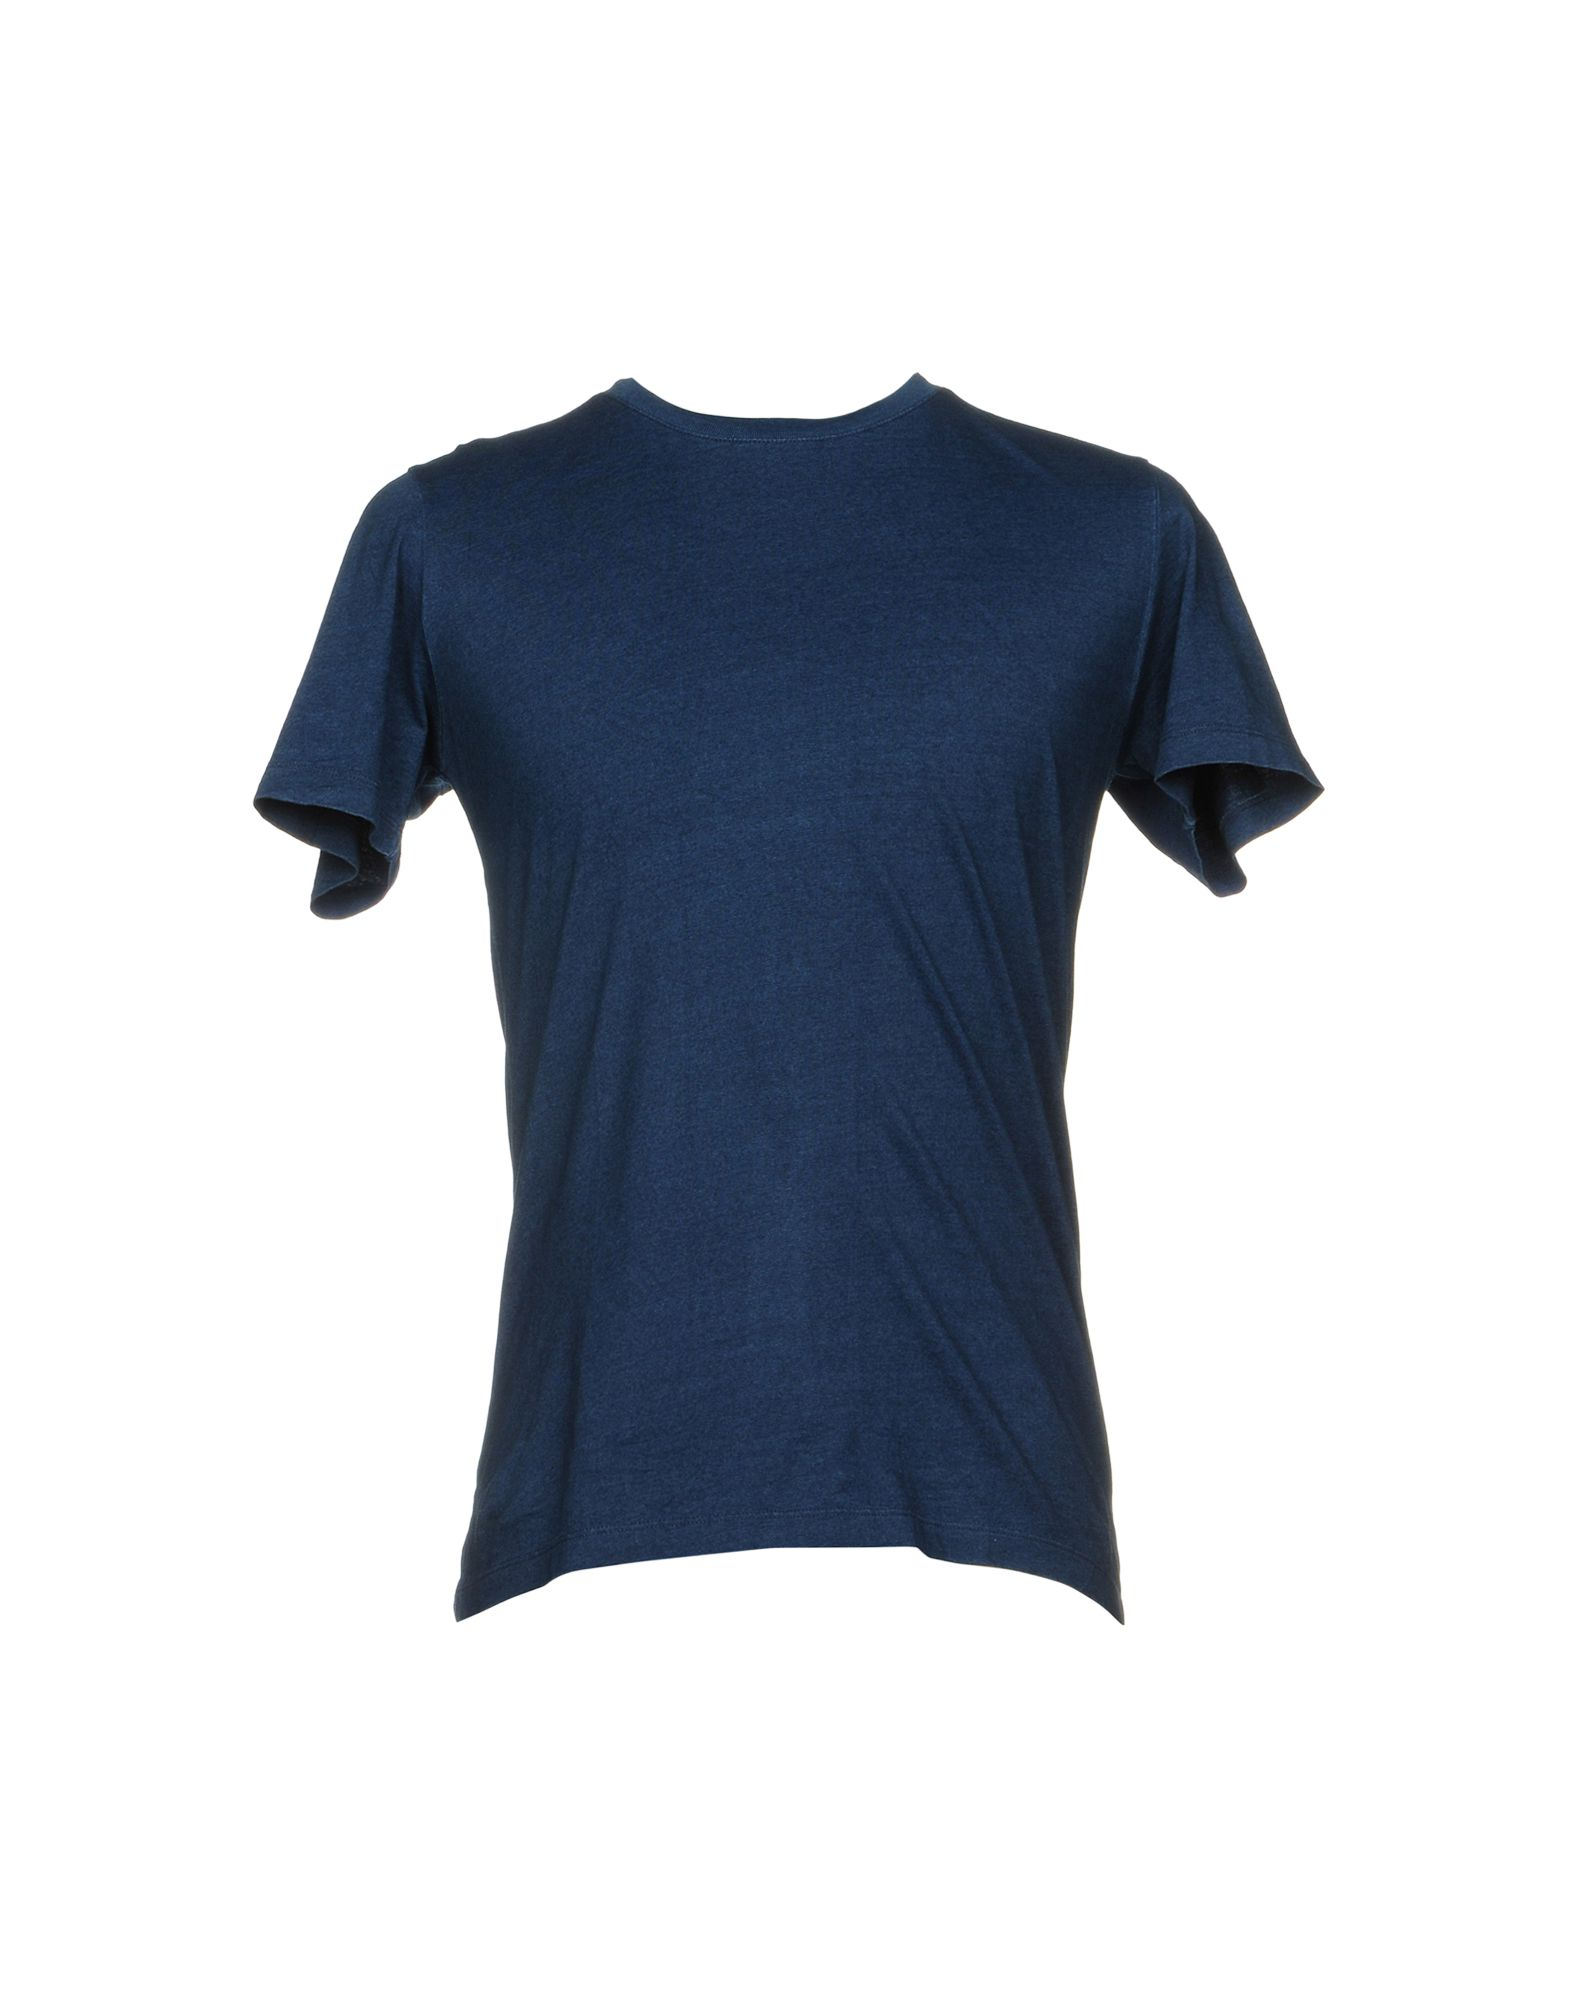 T-Shirt Intima Maison Margiela Uomo - Acquista online su